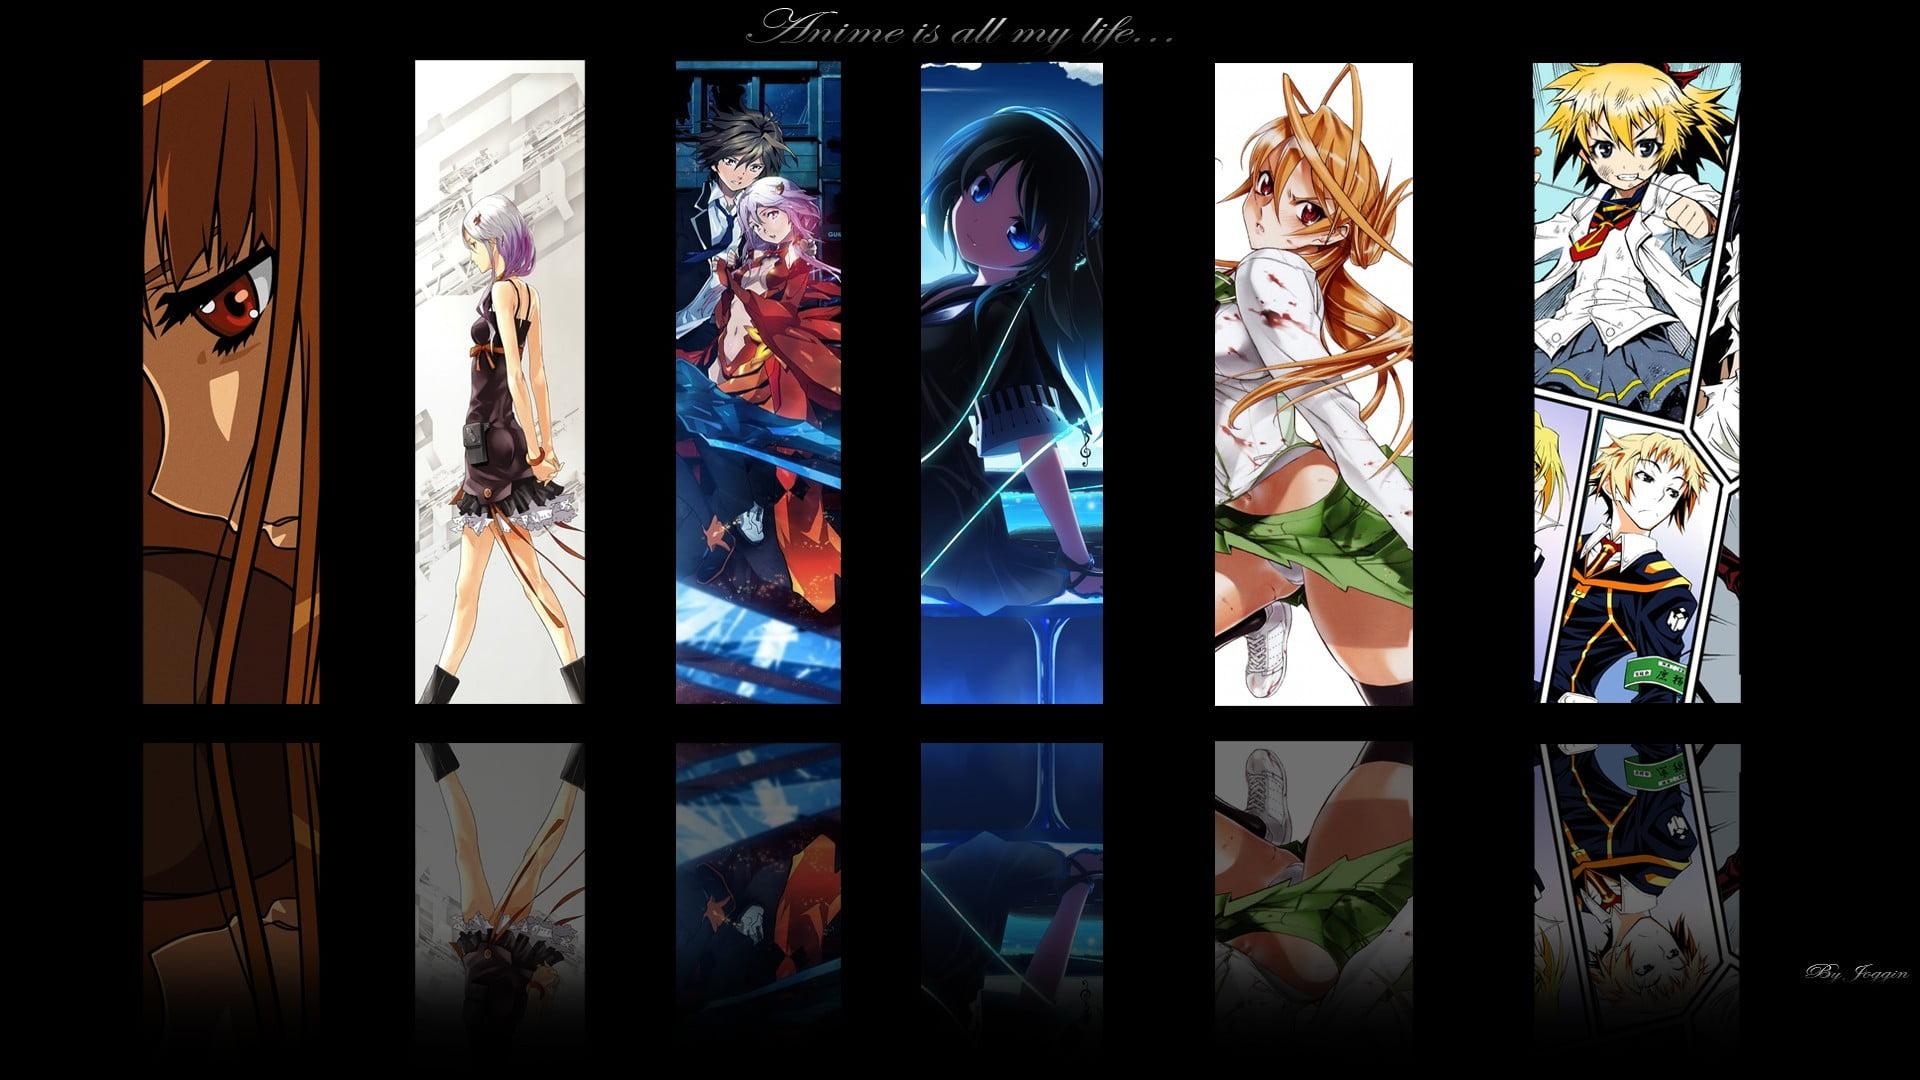 Imagenes 4k Anime High School Of The Dead - HD Wallpaper